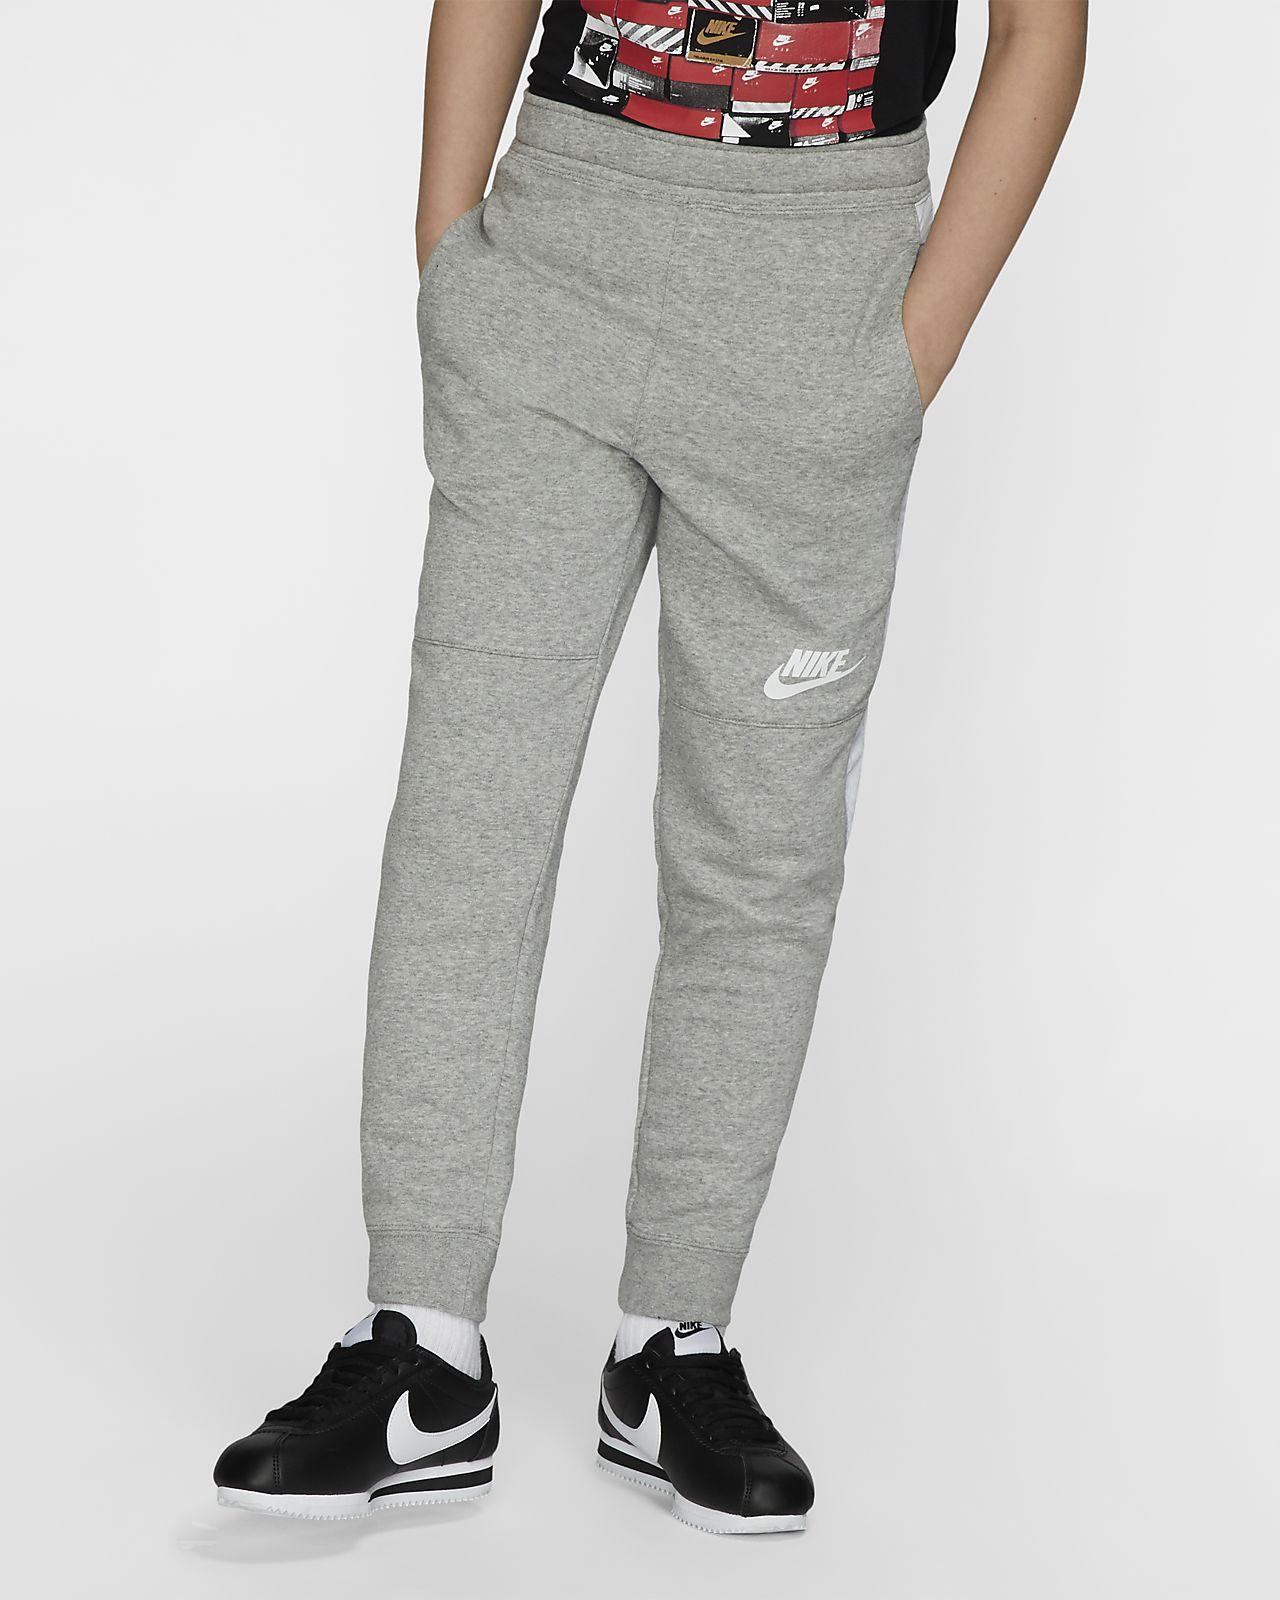 Jogger Nike Sportswear - Ragazzi